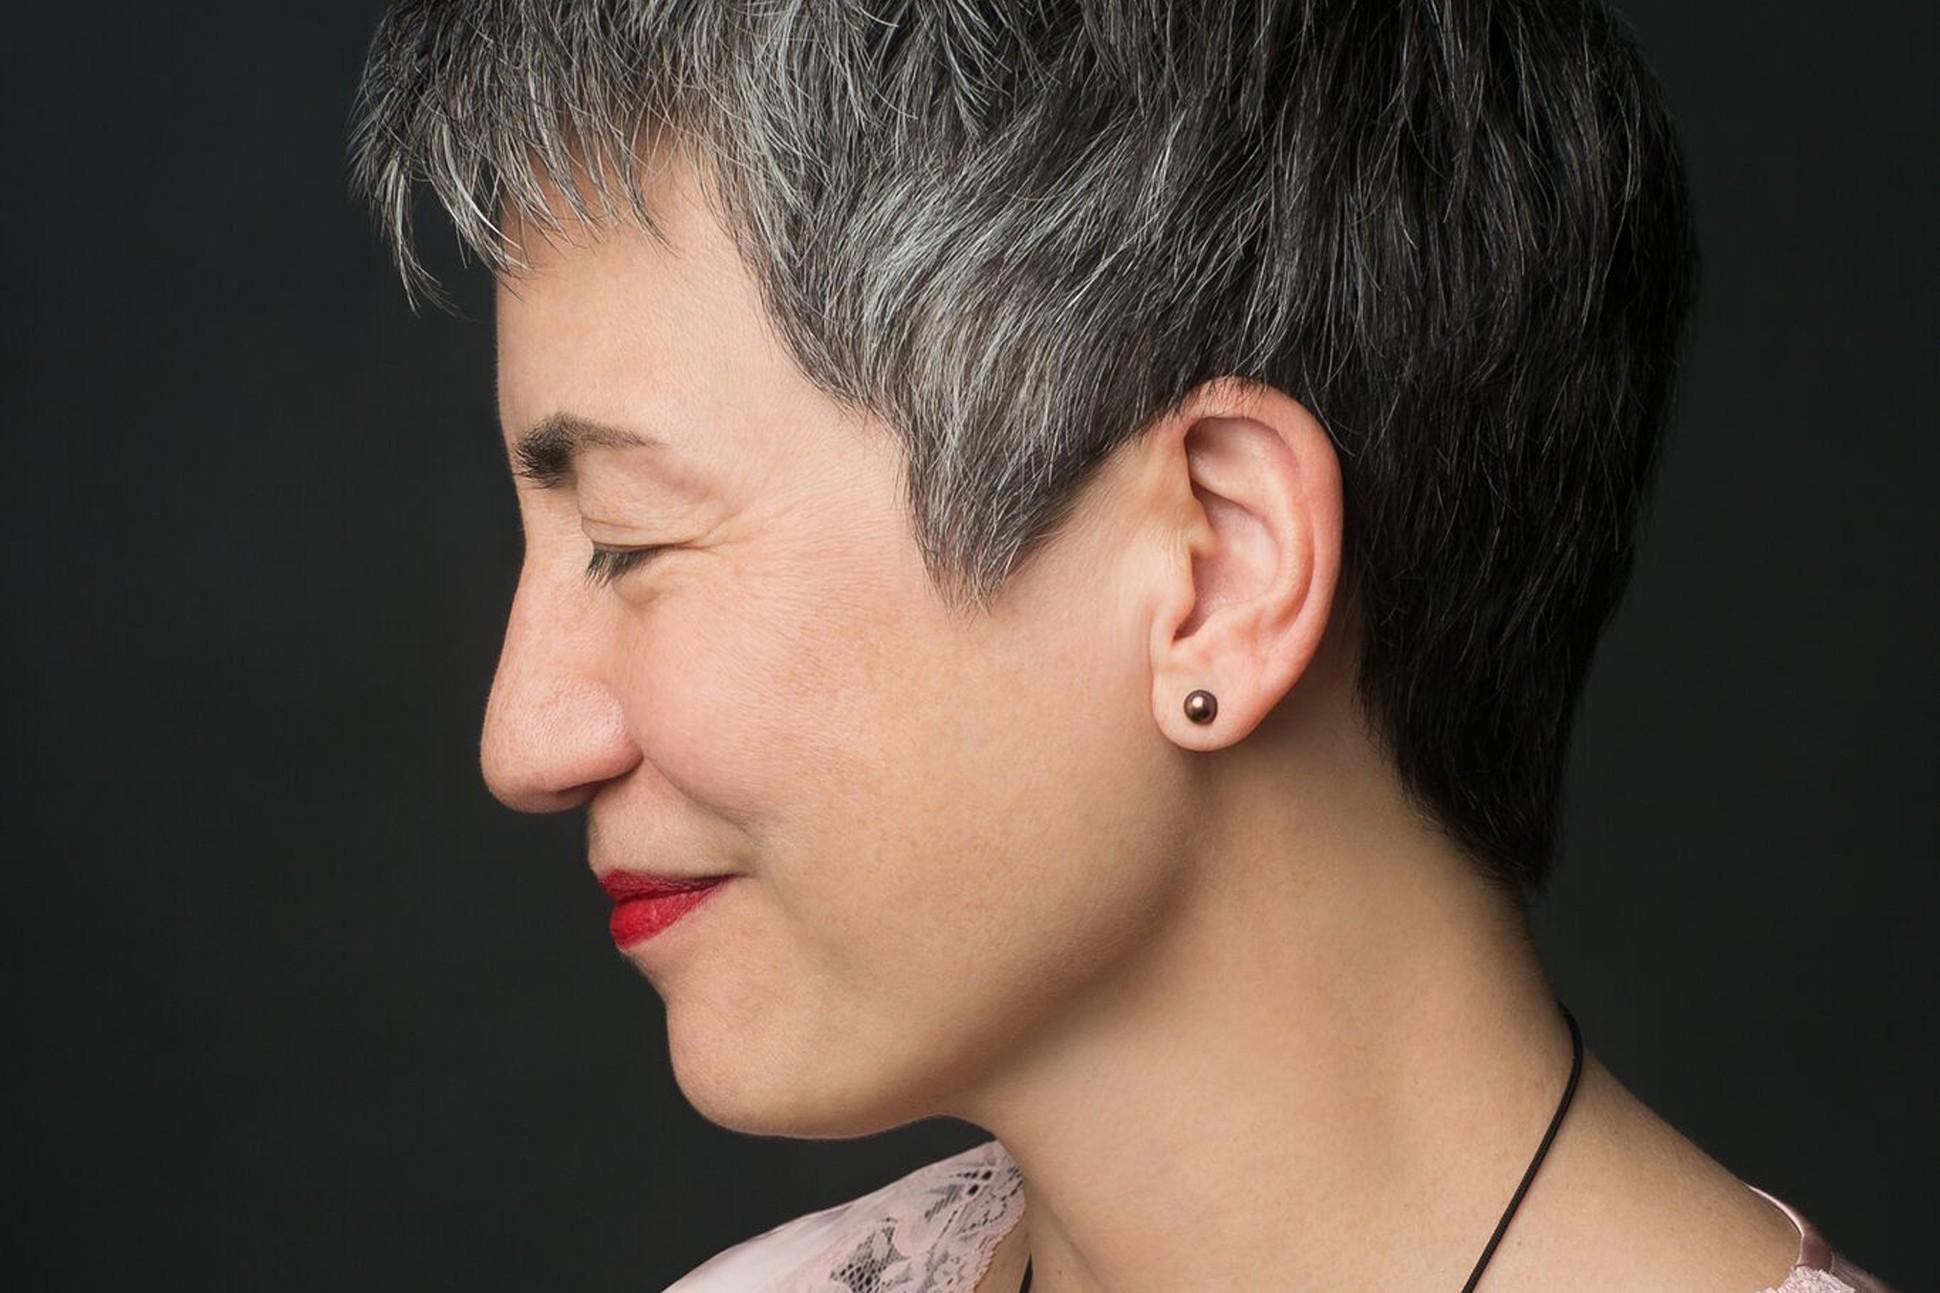 Image of Kimiko Hahn